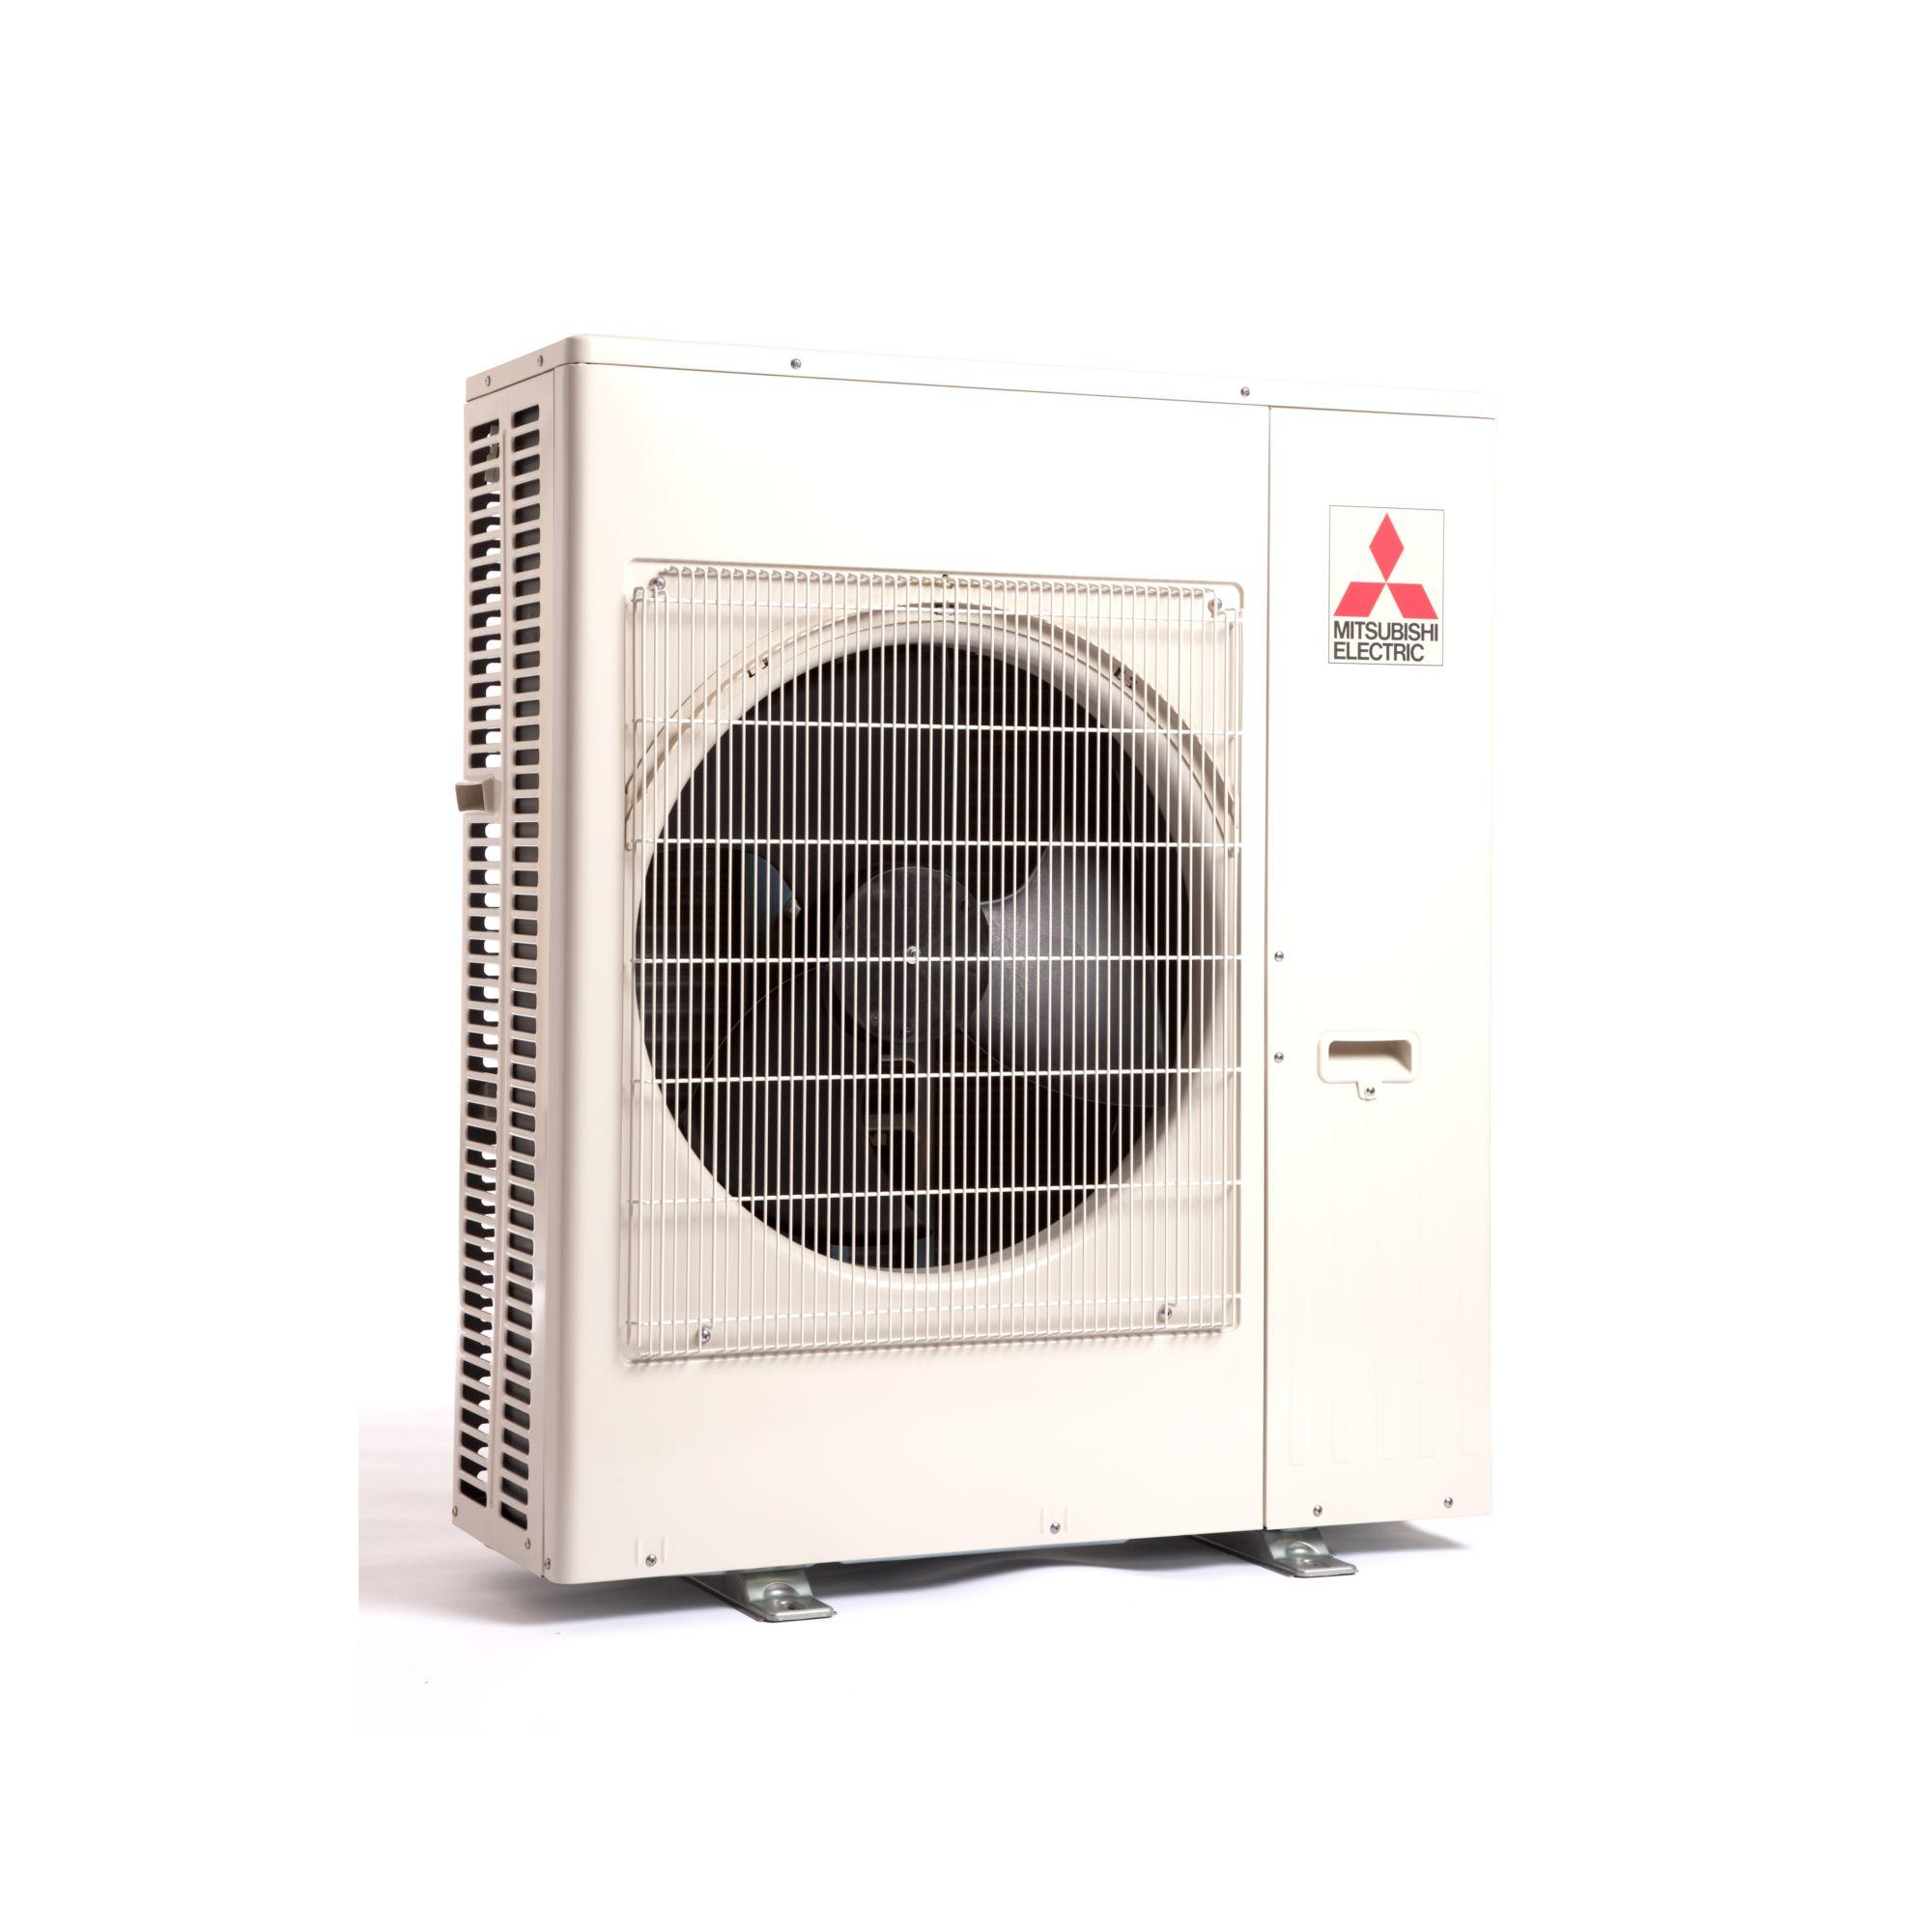 heating is three system mini portfolio hyper split ductless installation a hvac zone here pump img mitsubishi heat